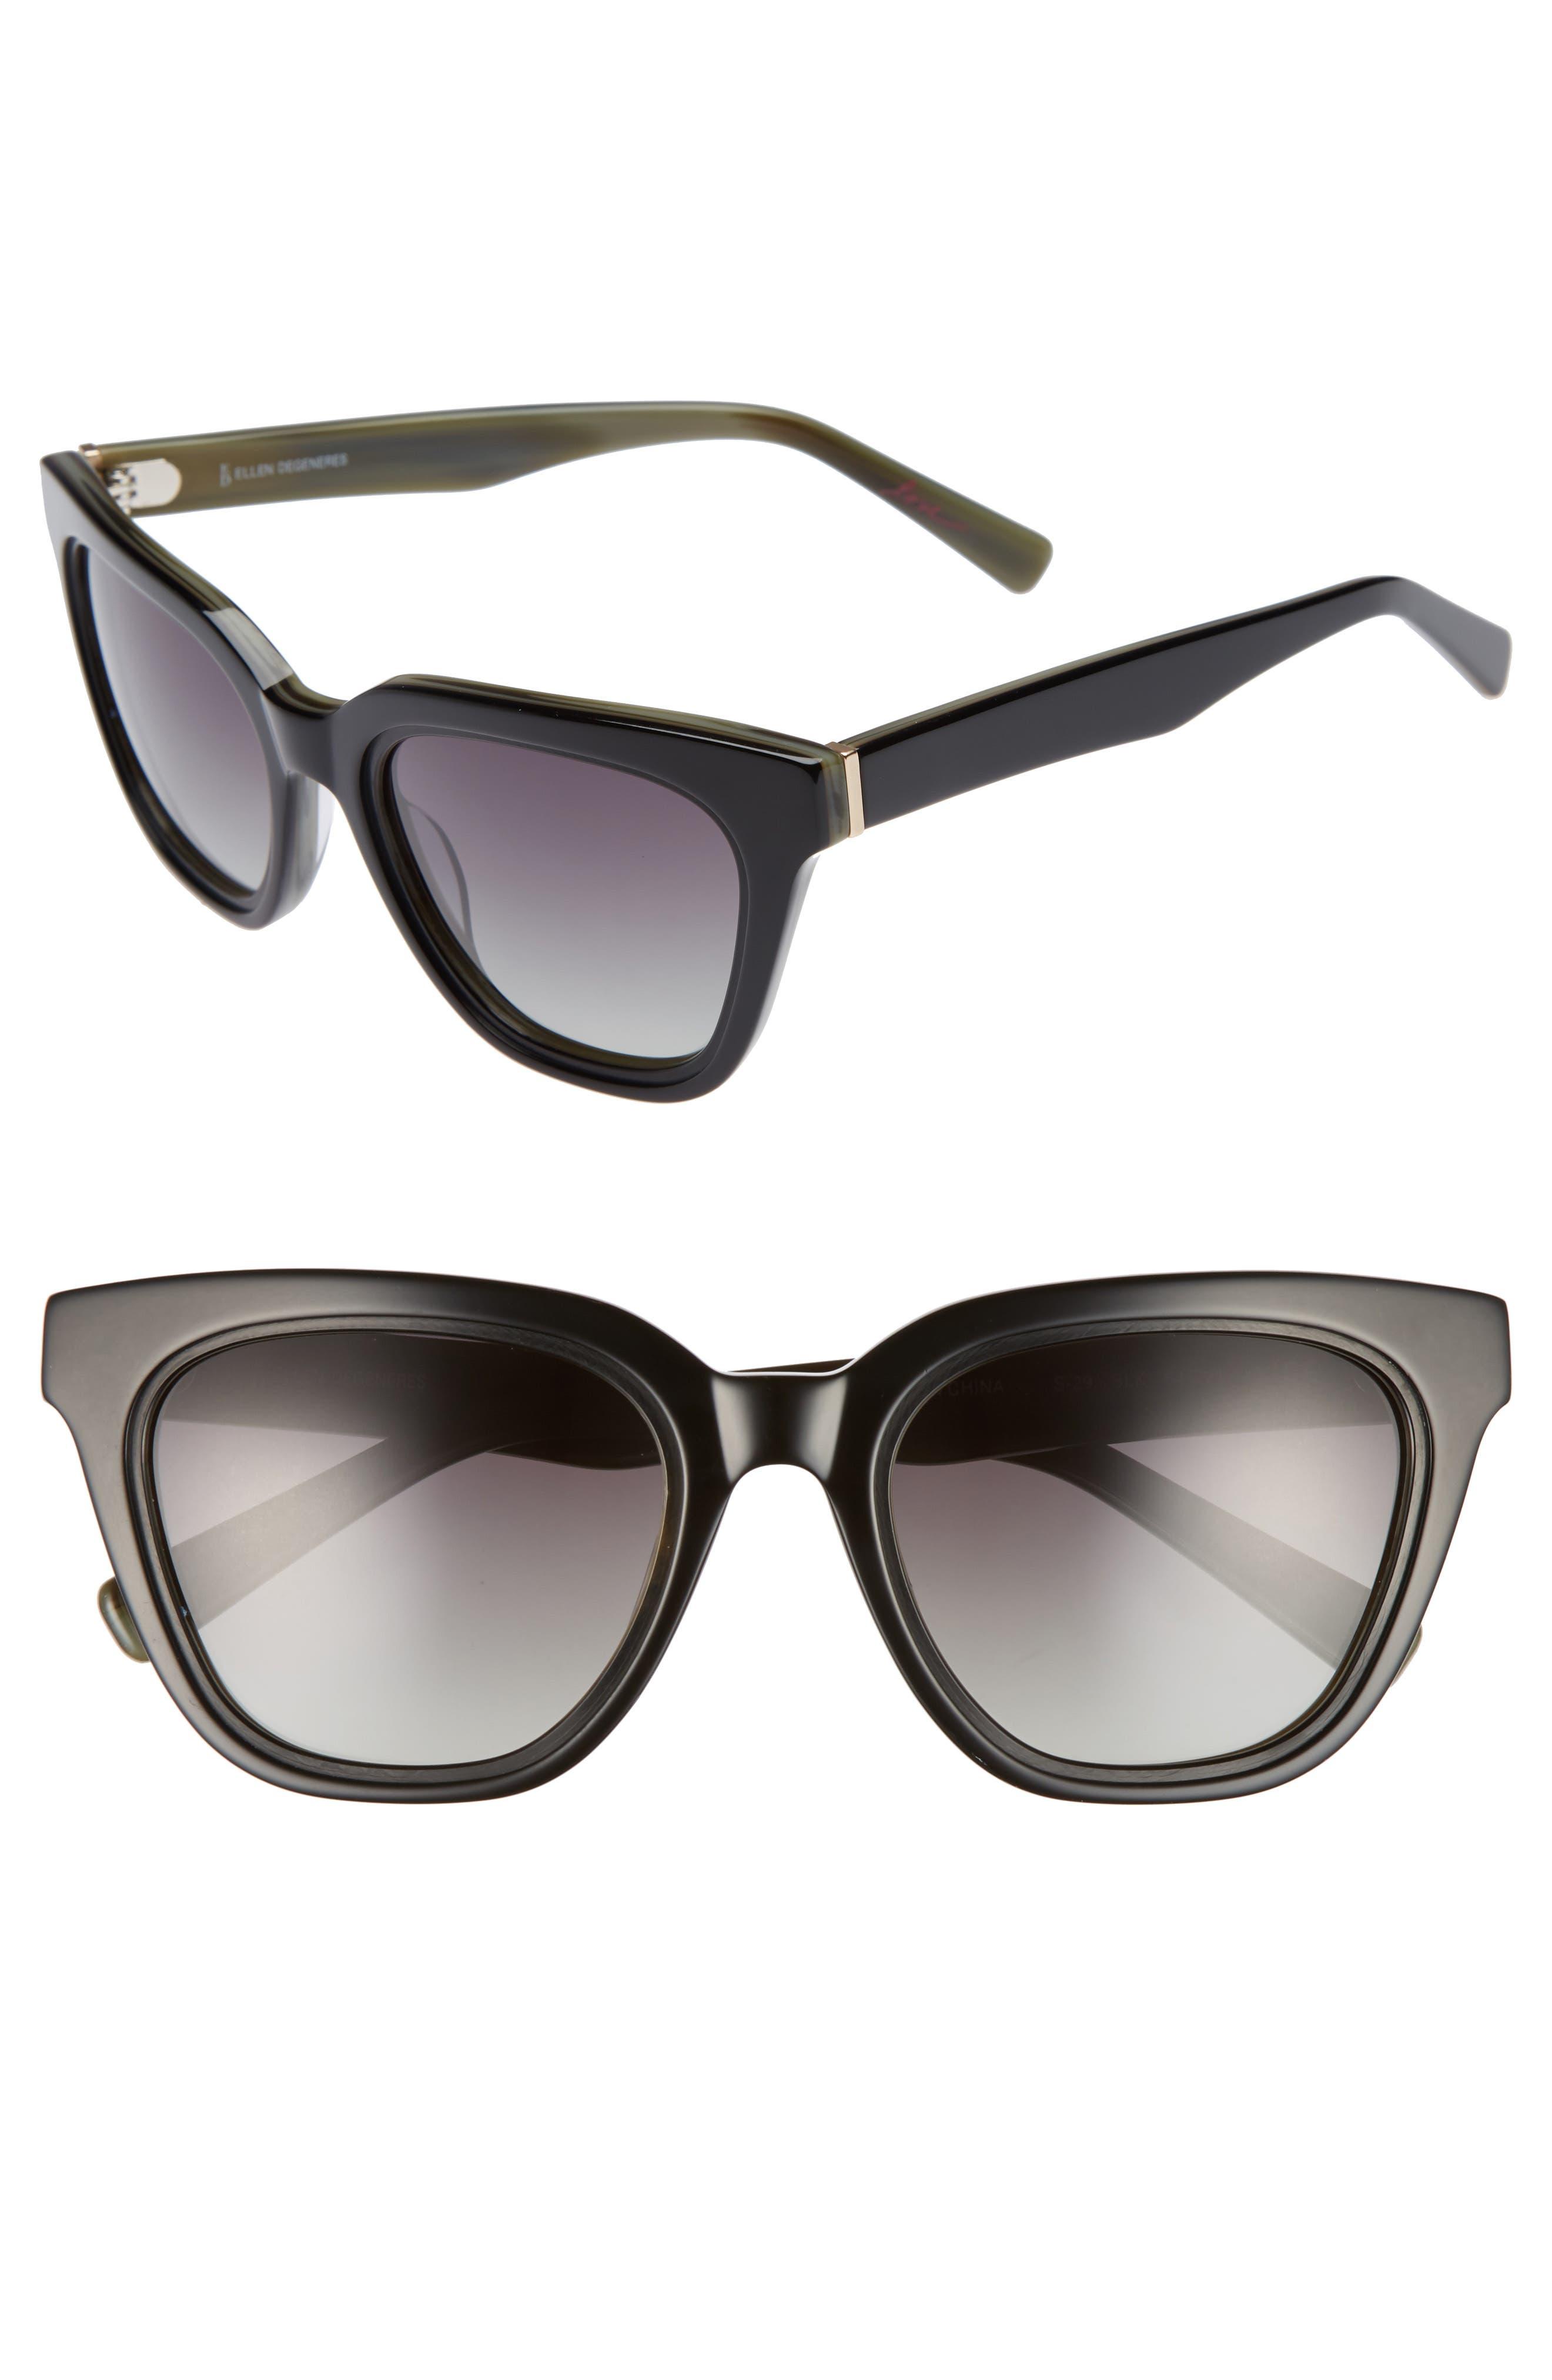 54mm Rectangular Cat Eye Sunglasses,                             Main thumbnail 1, color,                             001